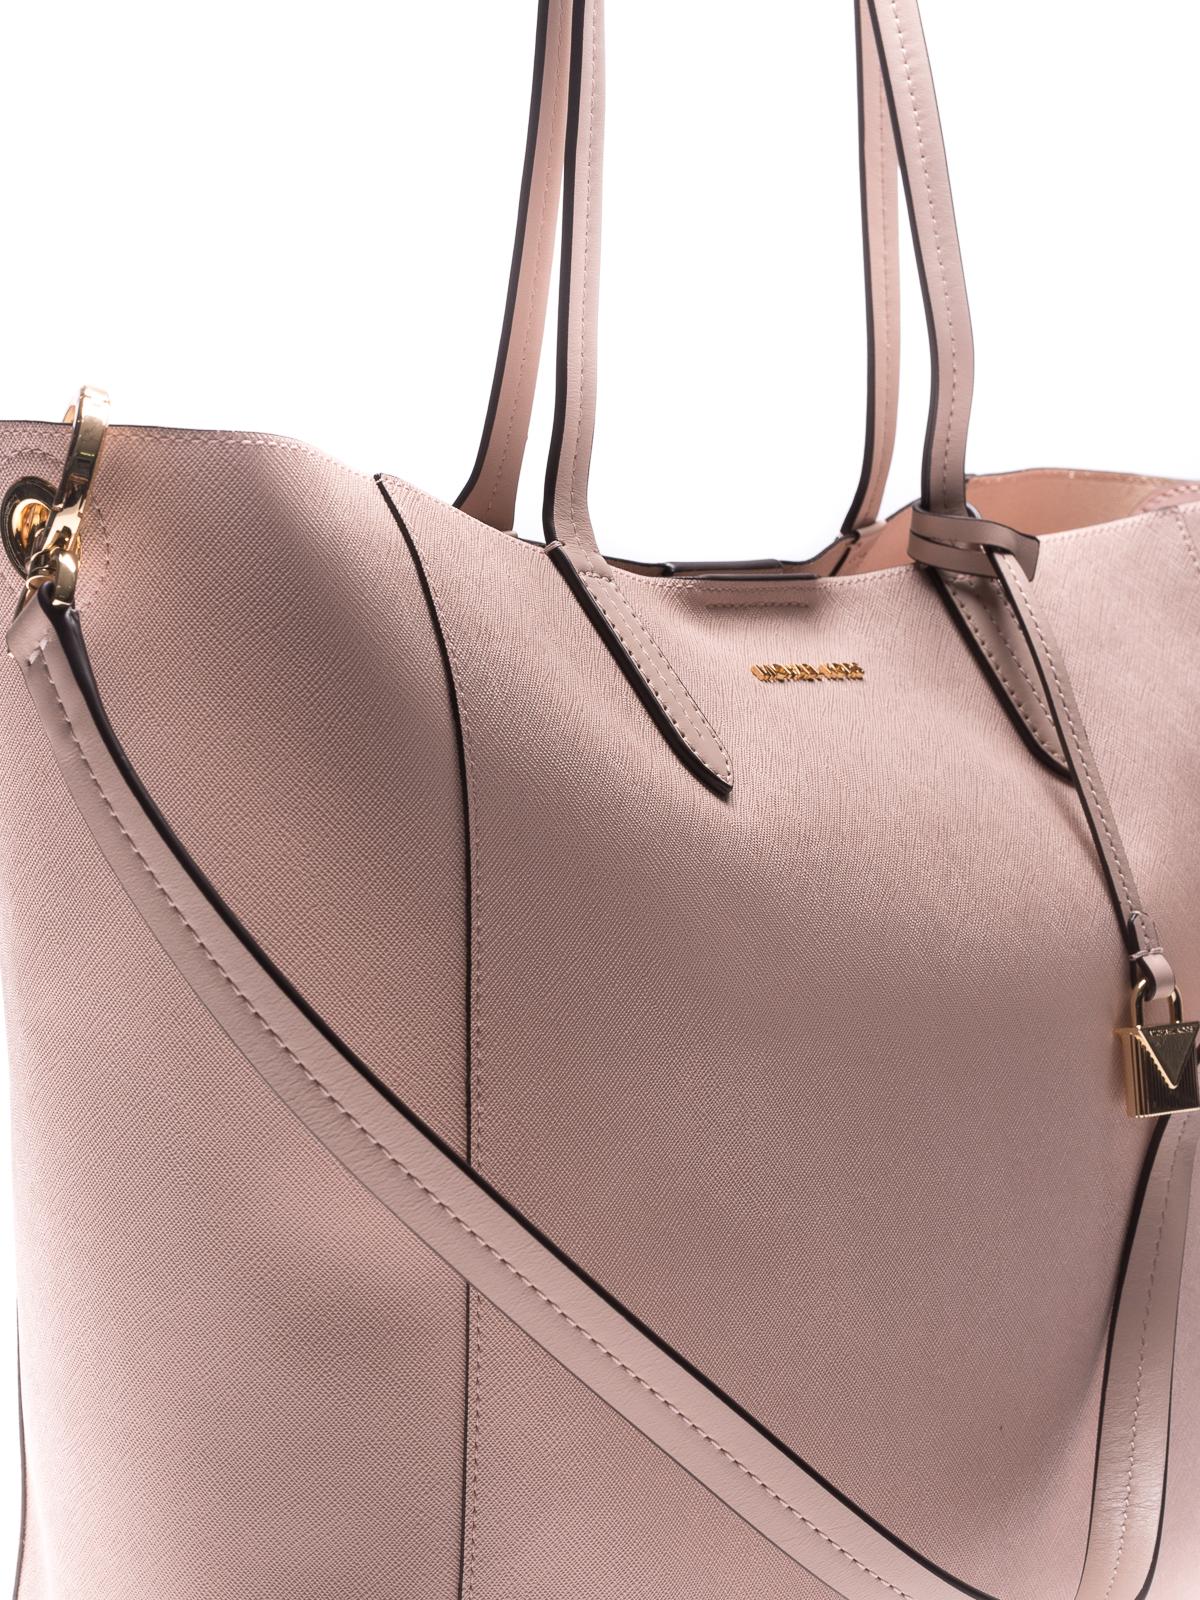 6fb49def03b6 Michael Kors - Penny convertible pink twill tote - totes bags ...